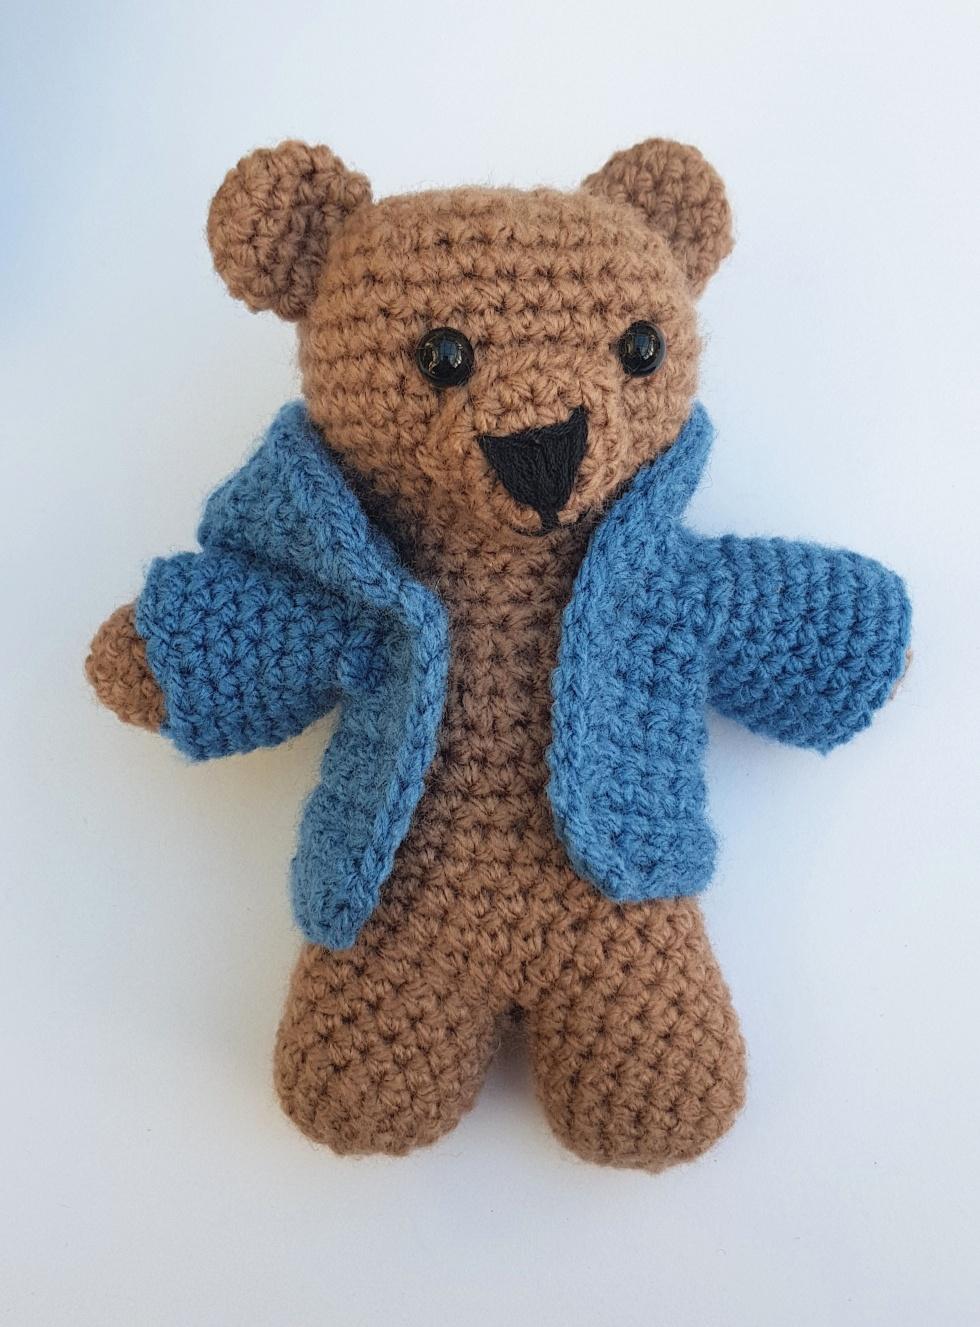 Snuggle Teddy Bear amigurumi pattern - Amigurumipatterns.net | 1327x980